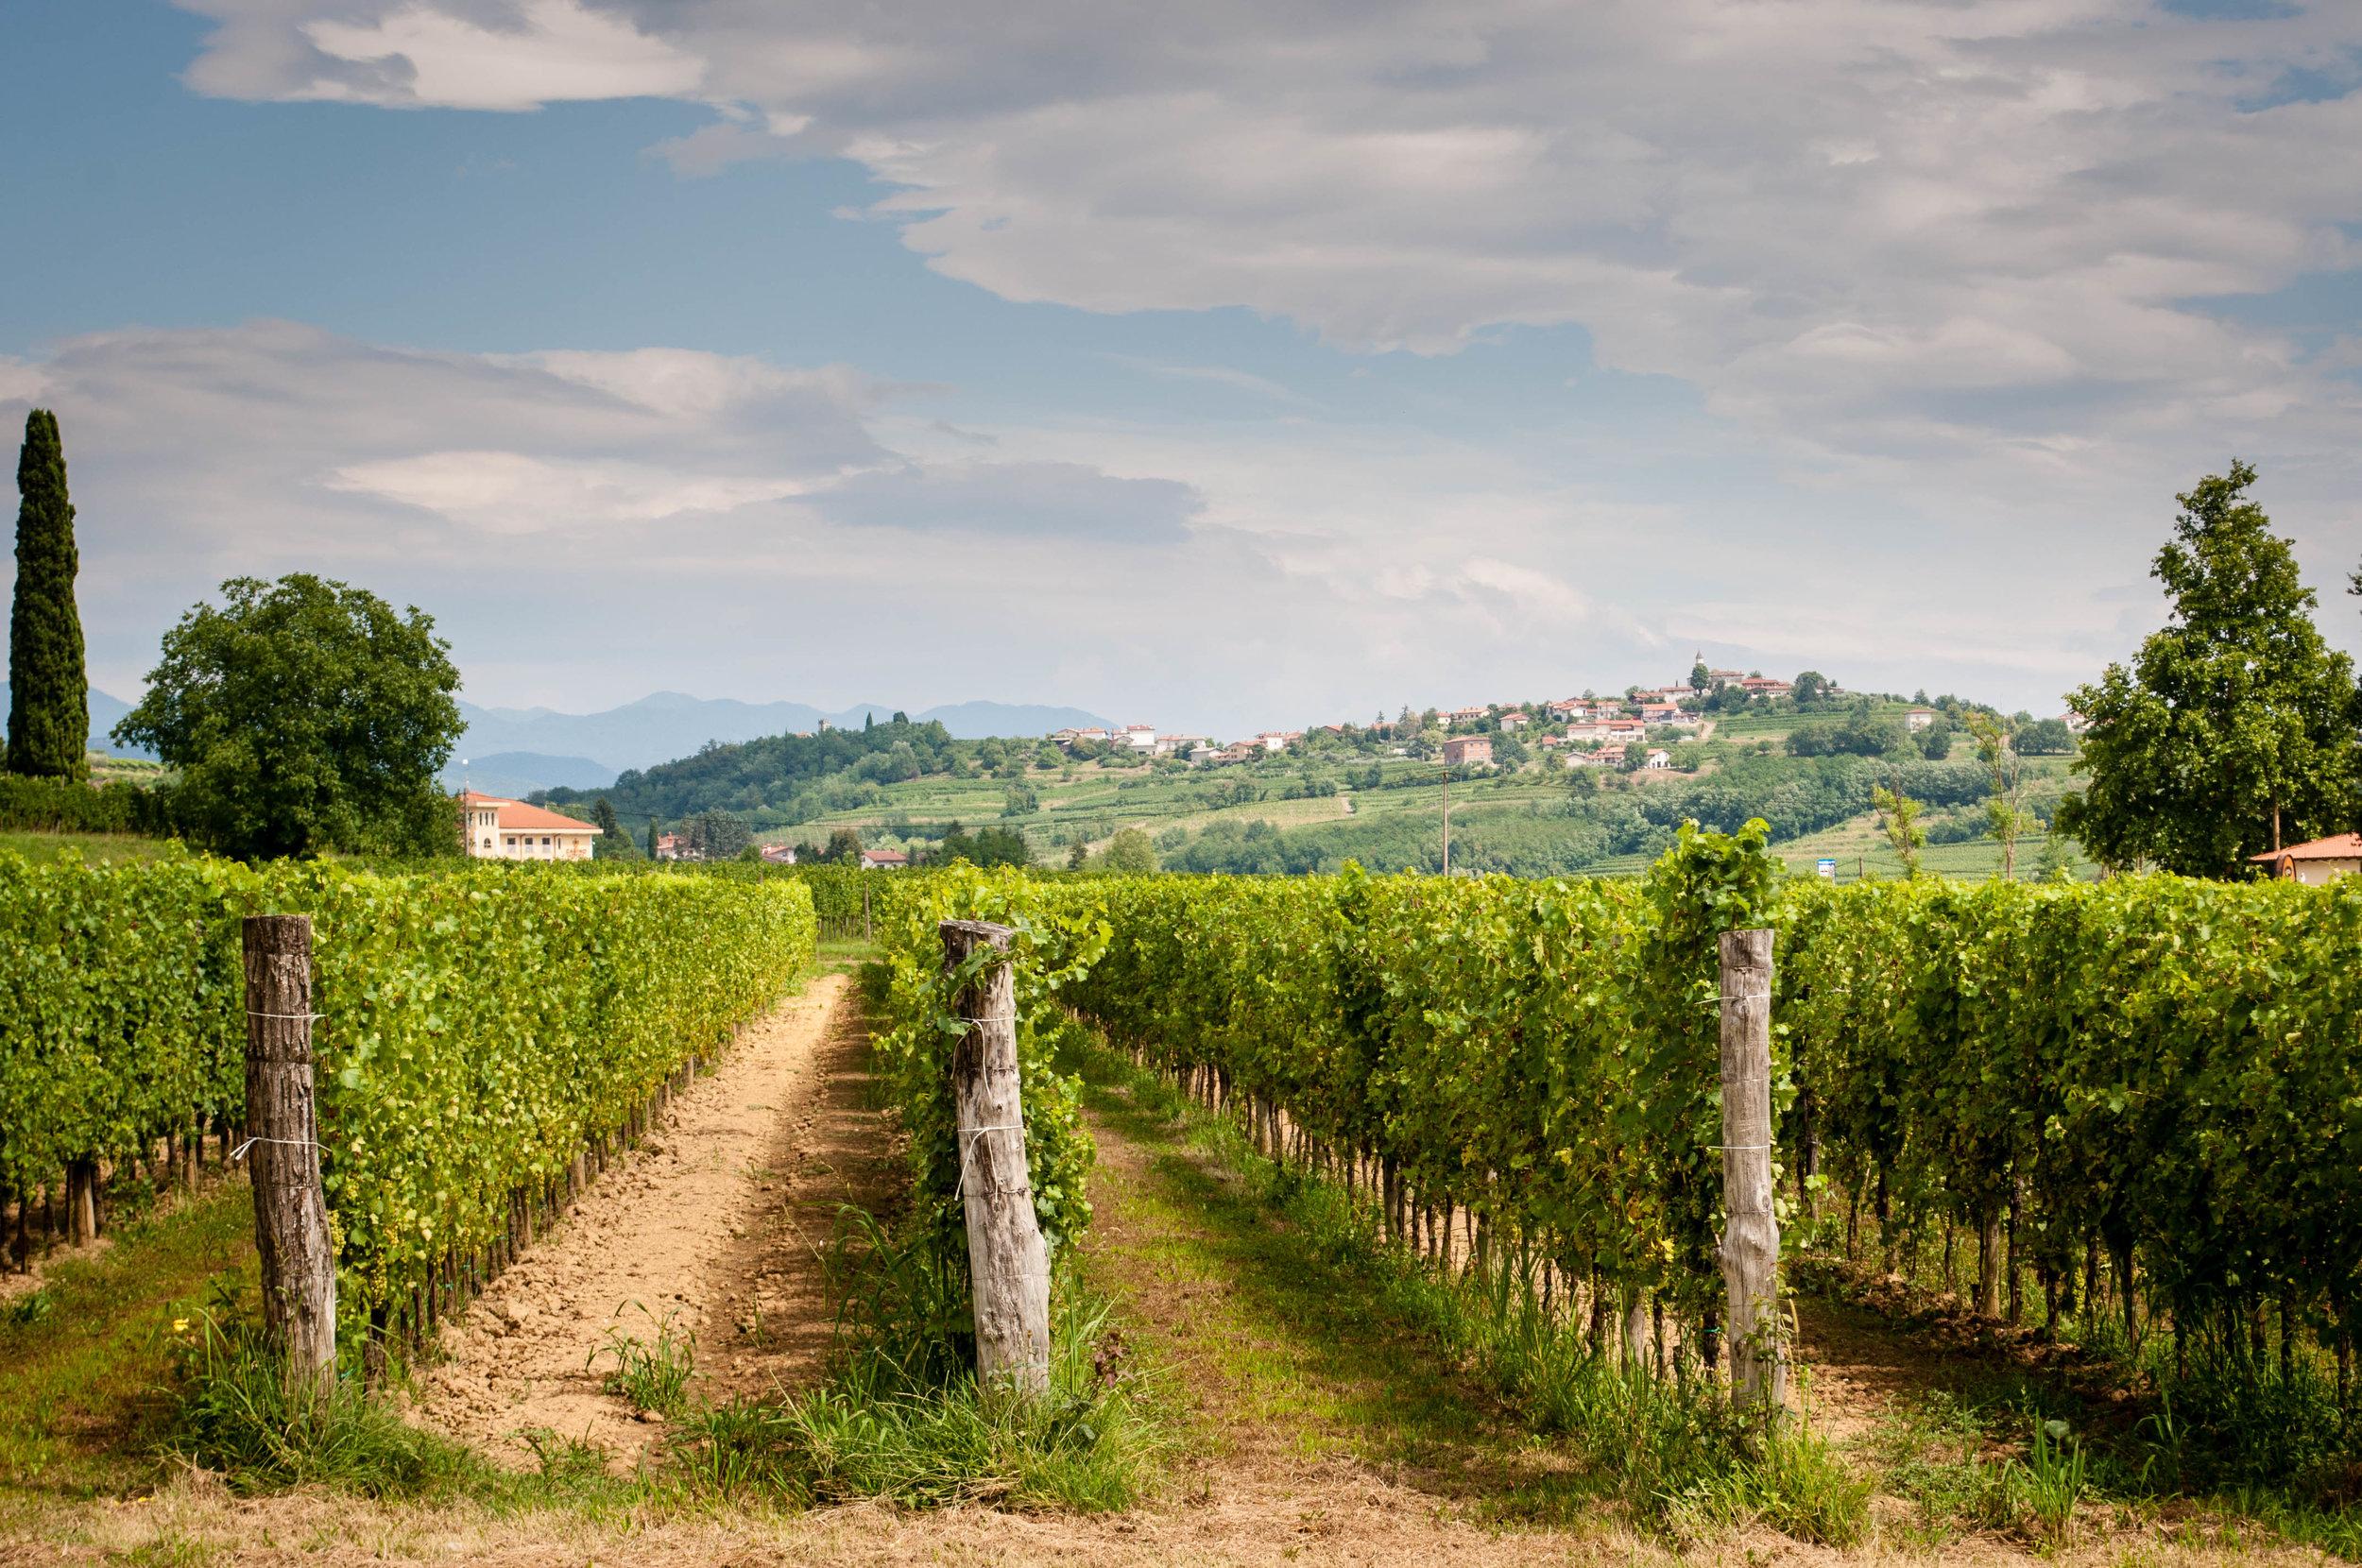 Vineyard in Brda, Slovenia wine region